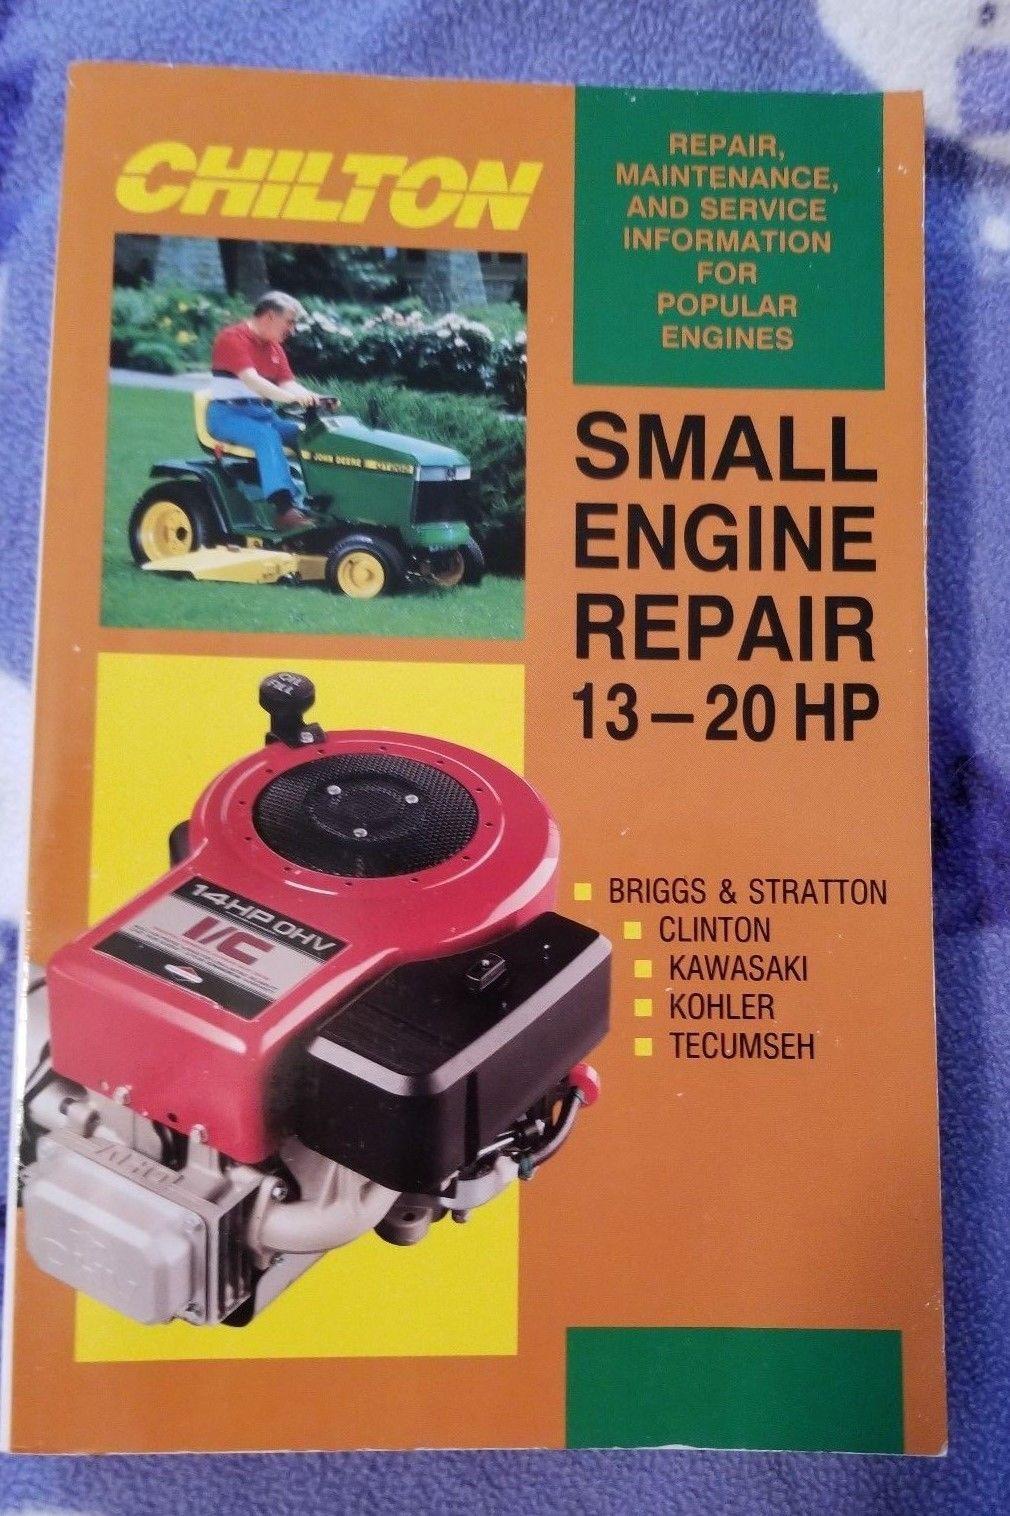 Chilton Small Engine Repair 13-20 HP (1993) B&S, Clinton, Kawasaki, Kohler  et al